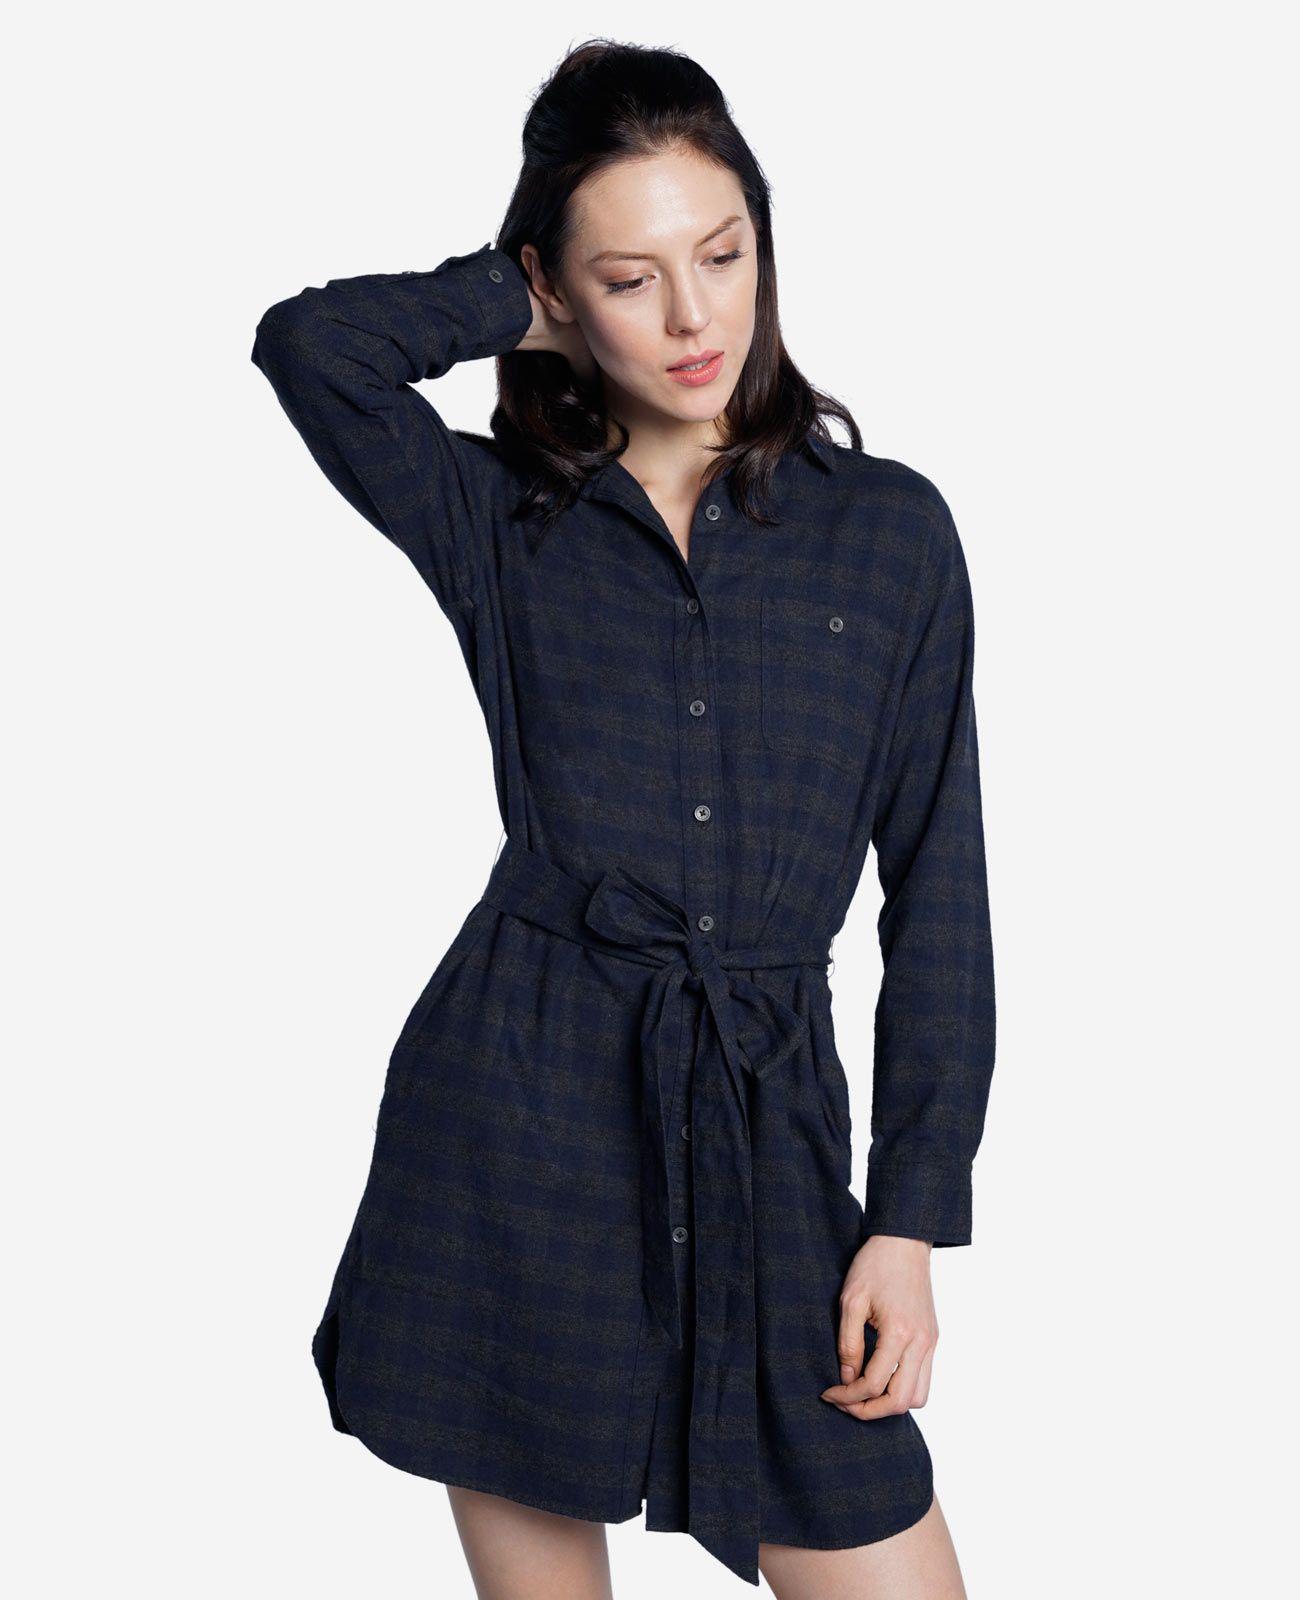 Flannel shirt with khaki pants  Flannel Shirt Dress  Italian Flannel  Pinterest  Flannels